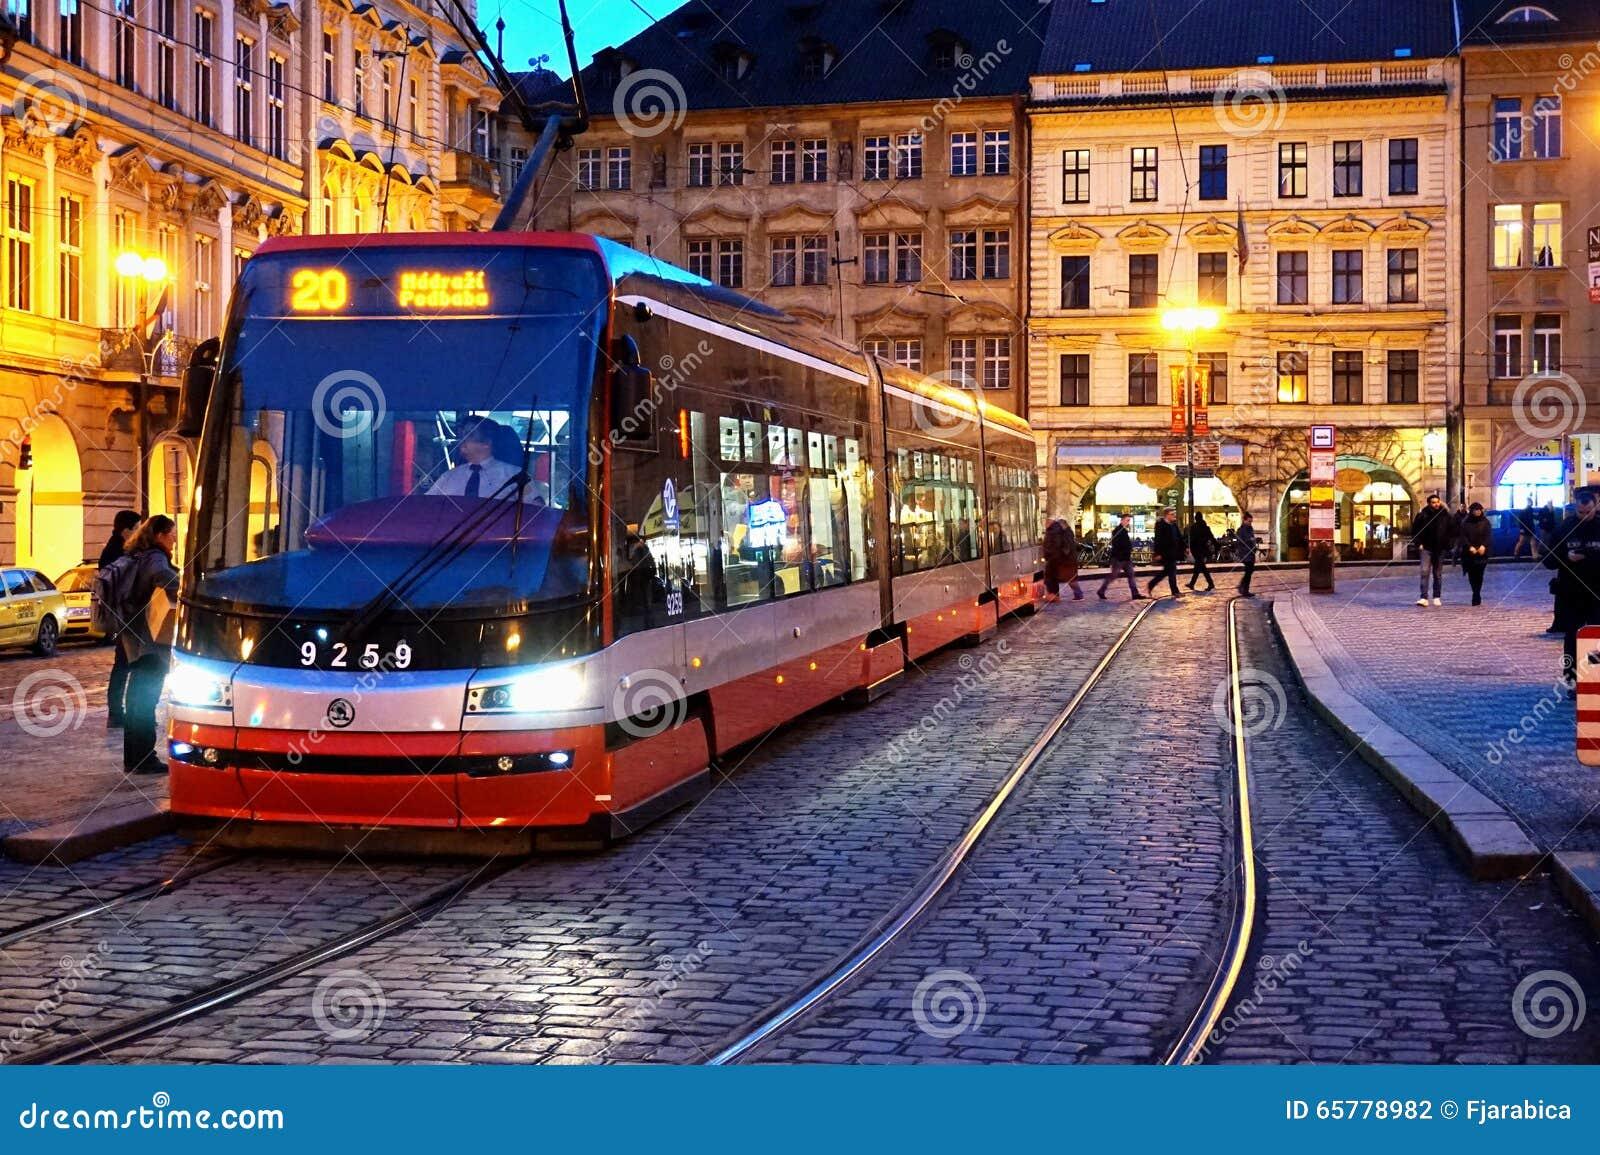 old tram prague street - photo #23